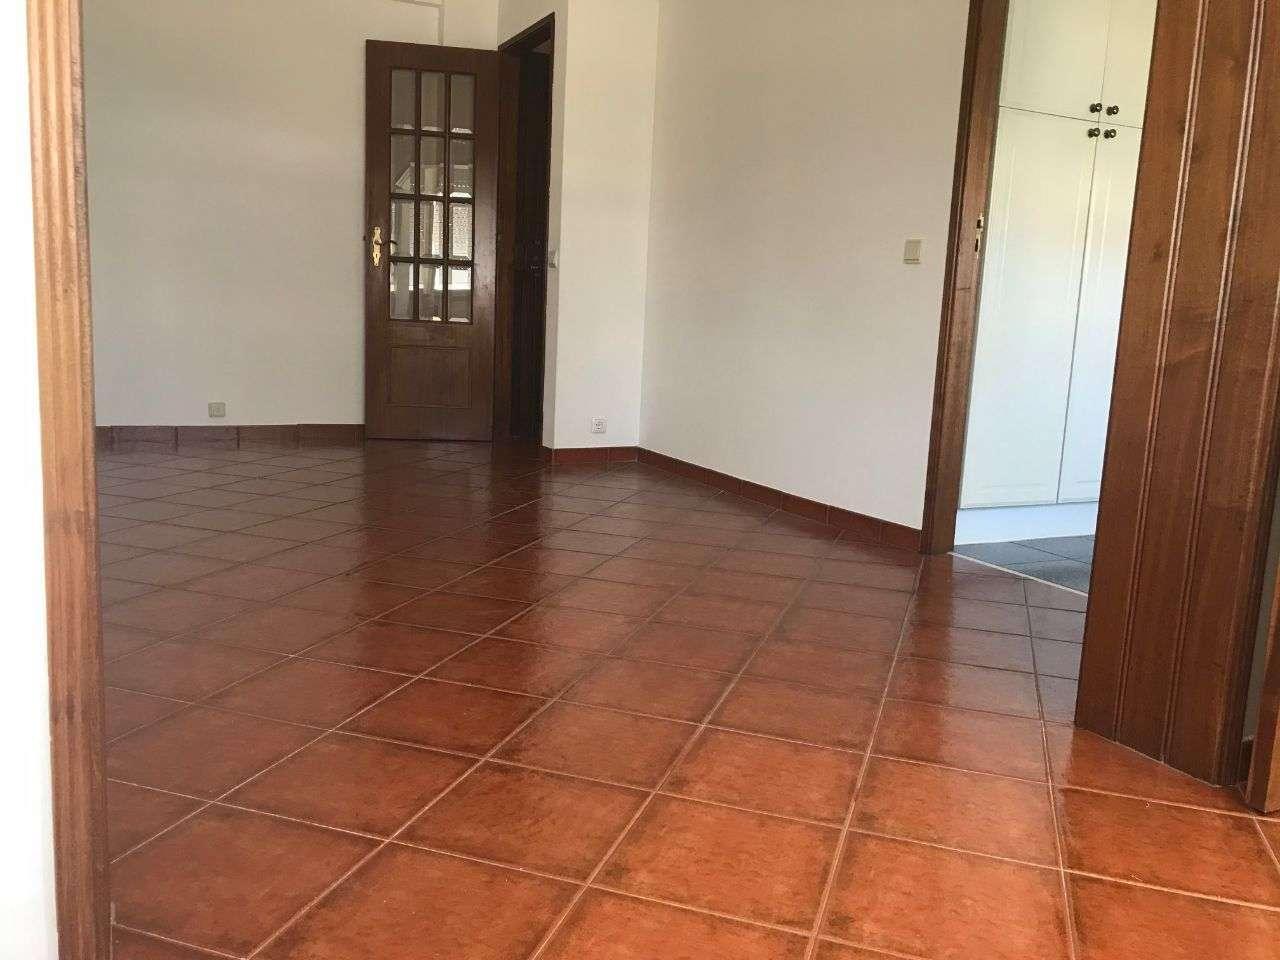 Apartamento para comprar, Santa Clara, Lisboa - Foto 5